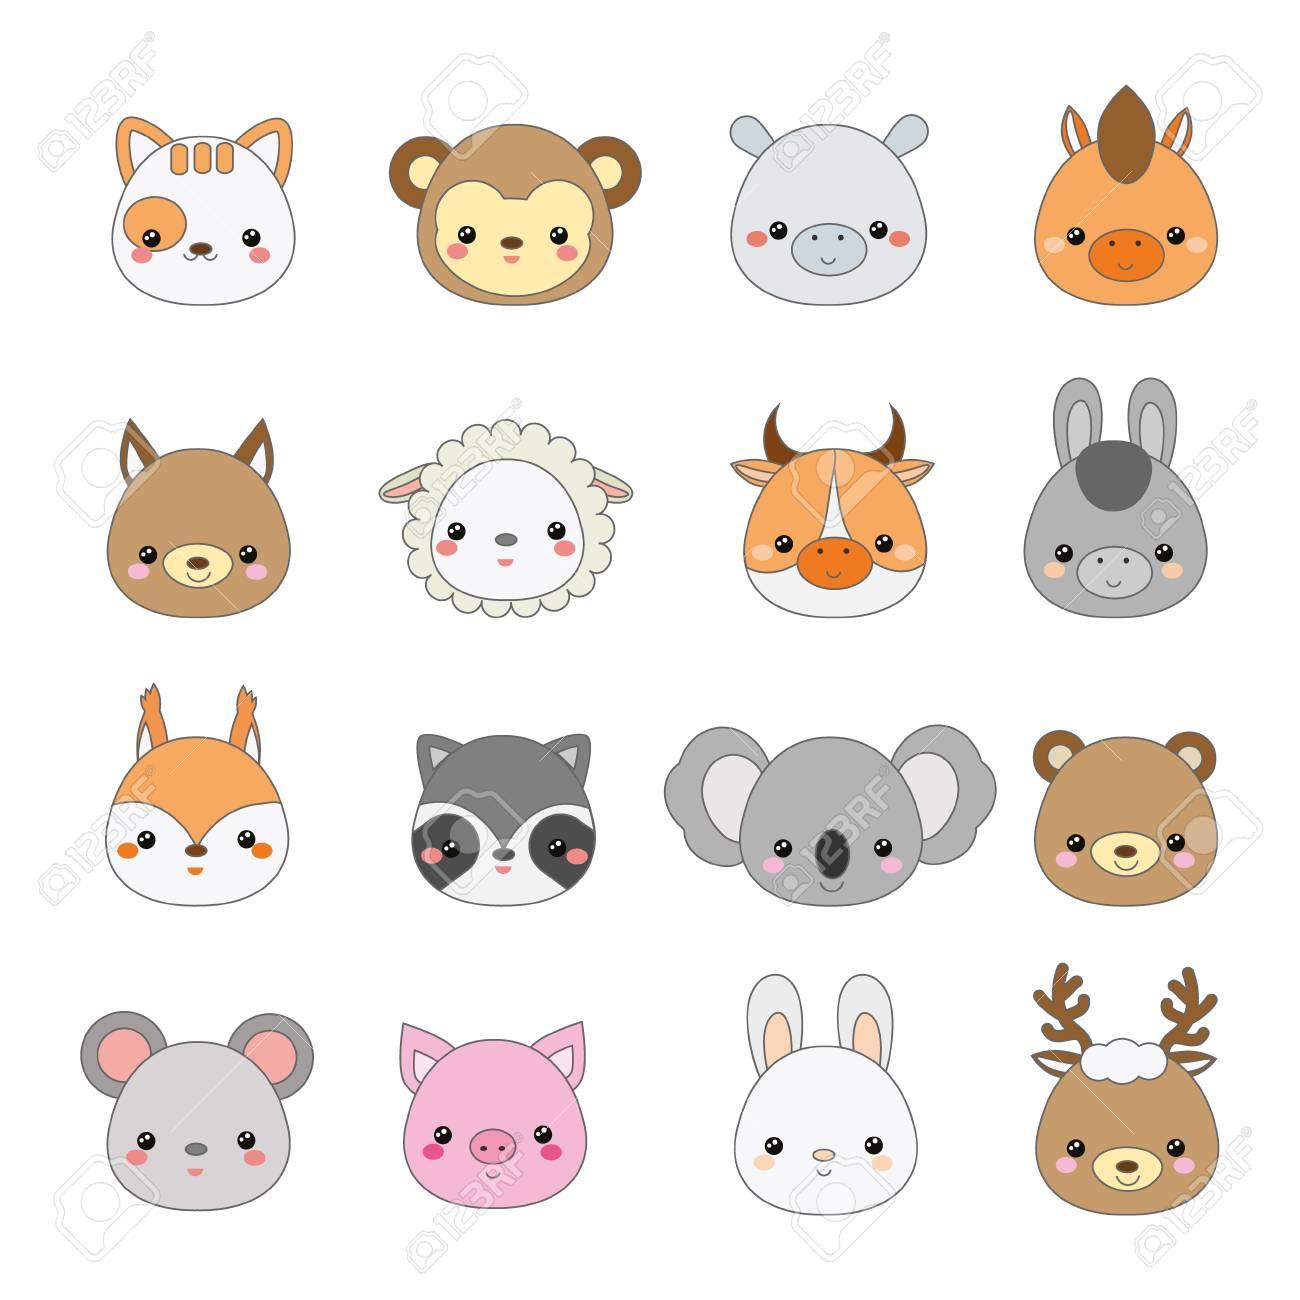 Cute animals faces  Big set of cartoon kawaii wildlife and farm